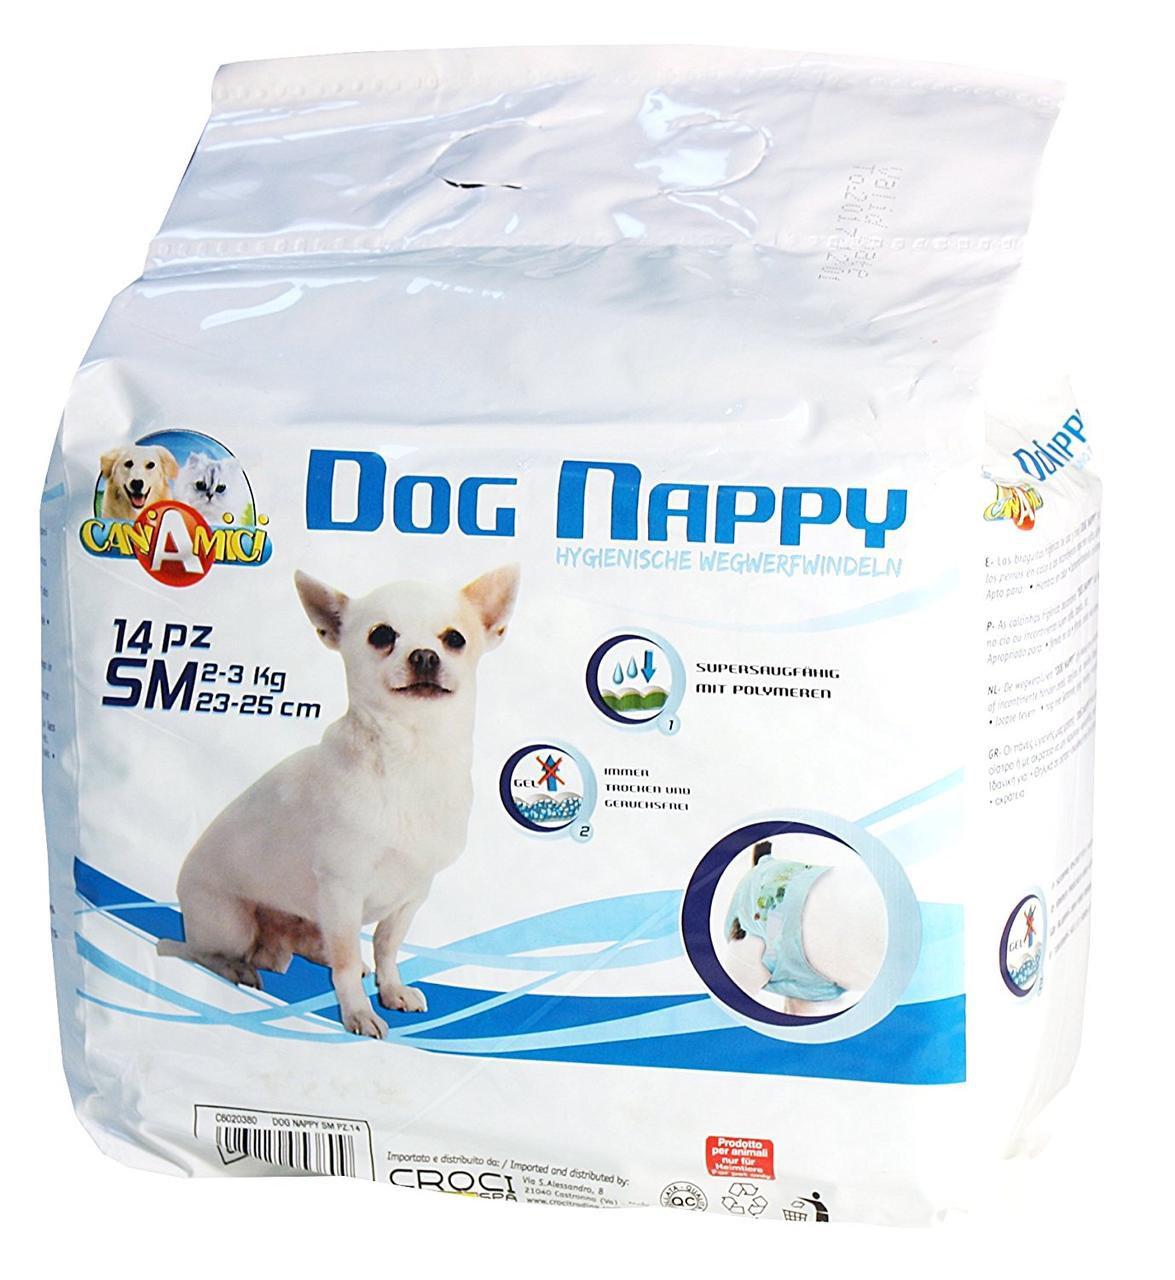 CROCI Dog Nappy sauskelnės šunim SM 2-3kg